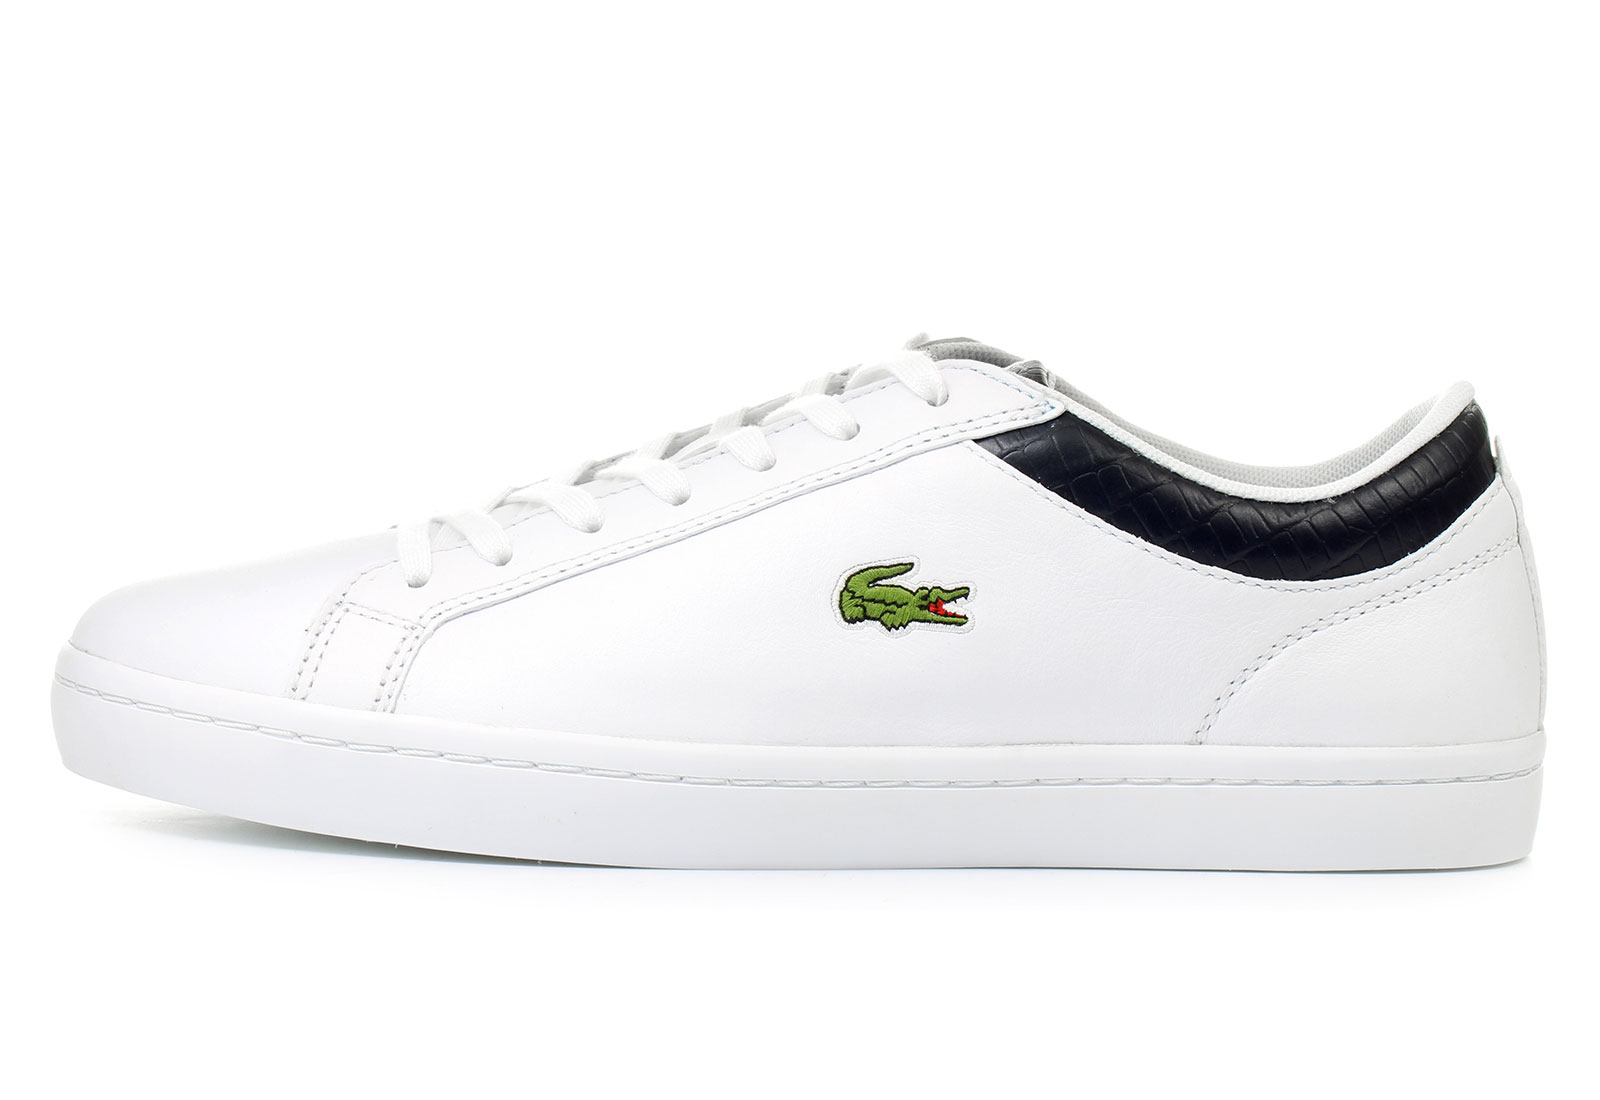 Lacoste Shoes - Straightset G 3 - 163spm0123-042 - Online shop for ... ce3948d670